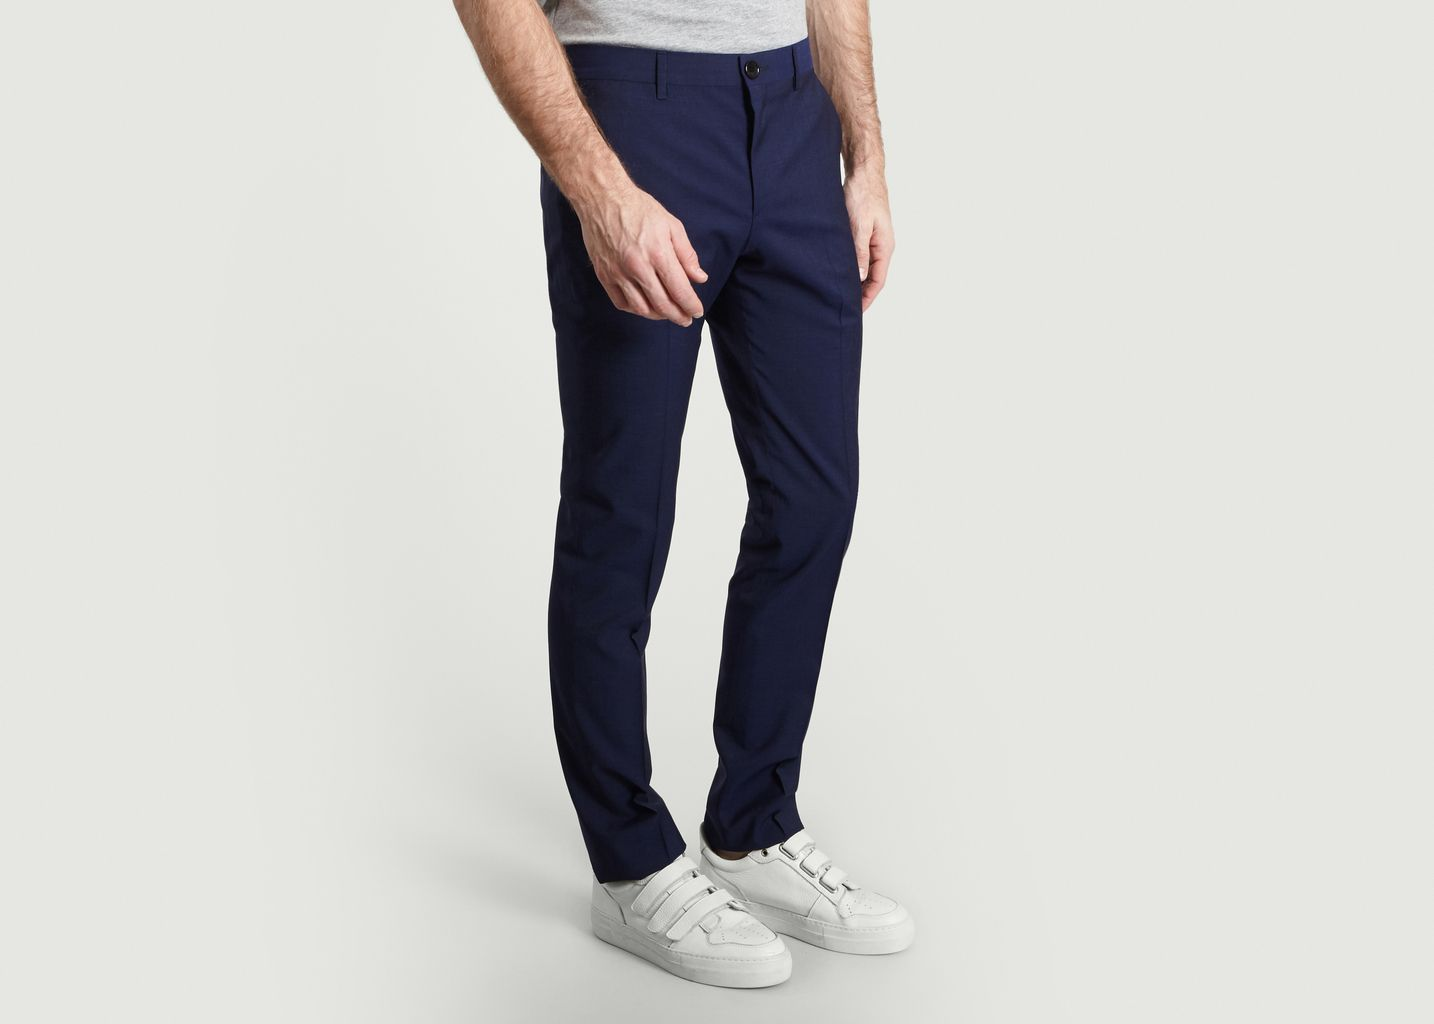 Pantalon de Costume Slim - PS by PAUL SMITH